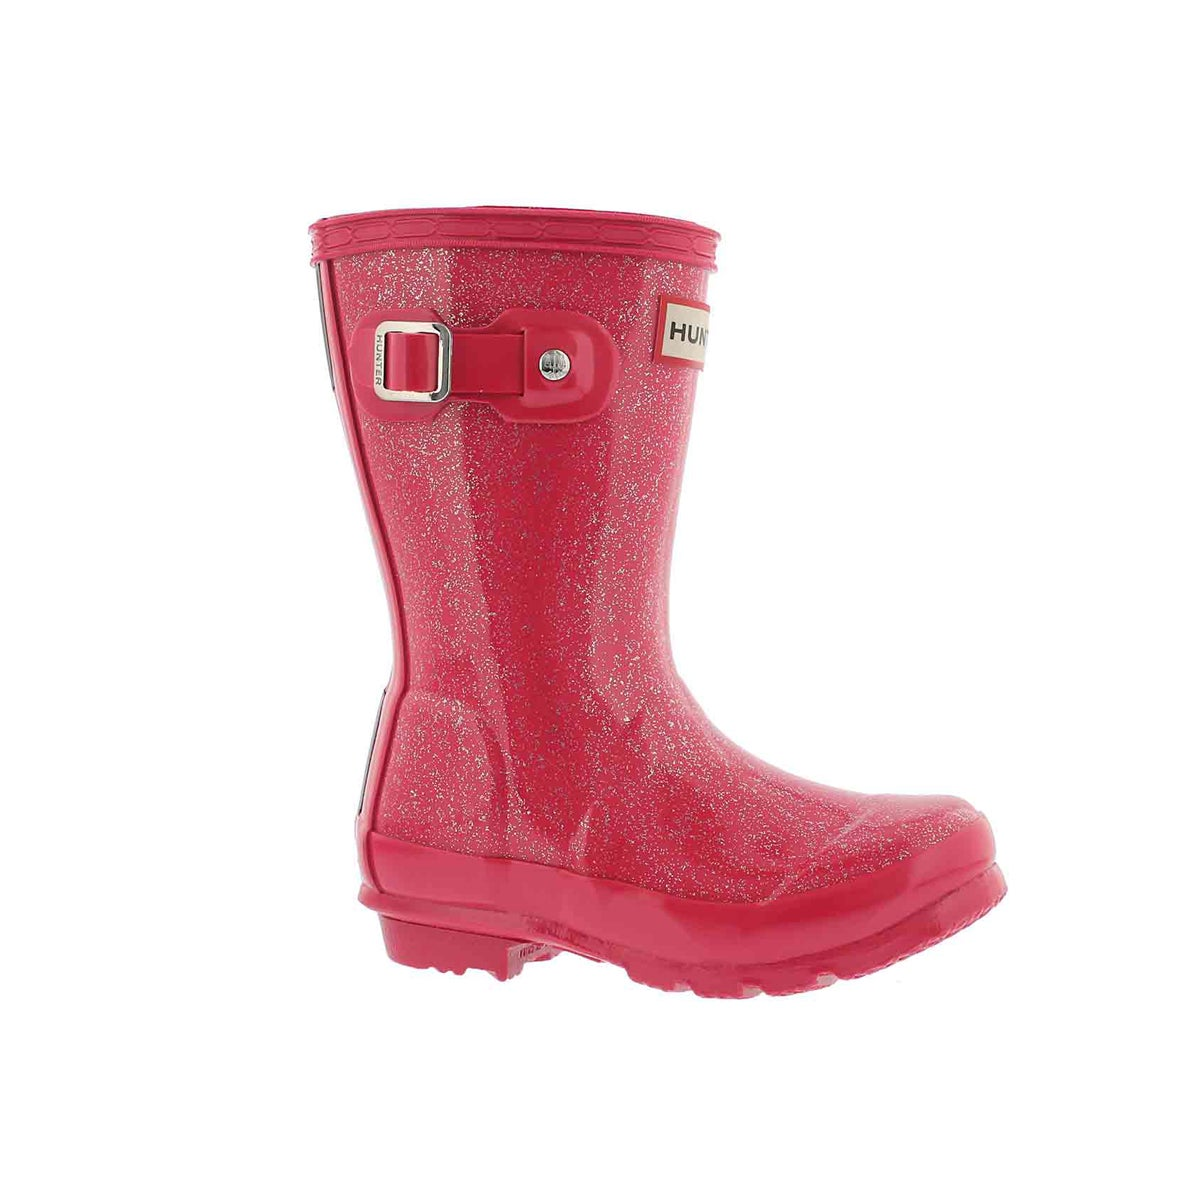 Infants' FIRST CLASSIC GLITTER pink rain boots